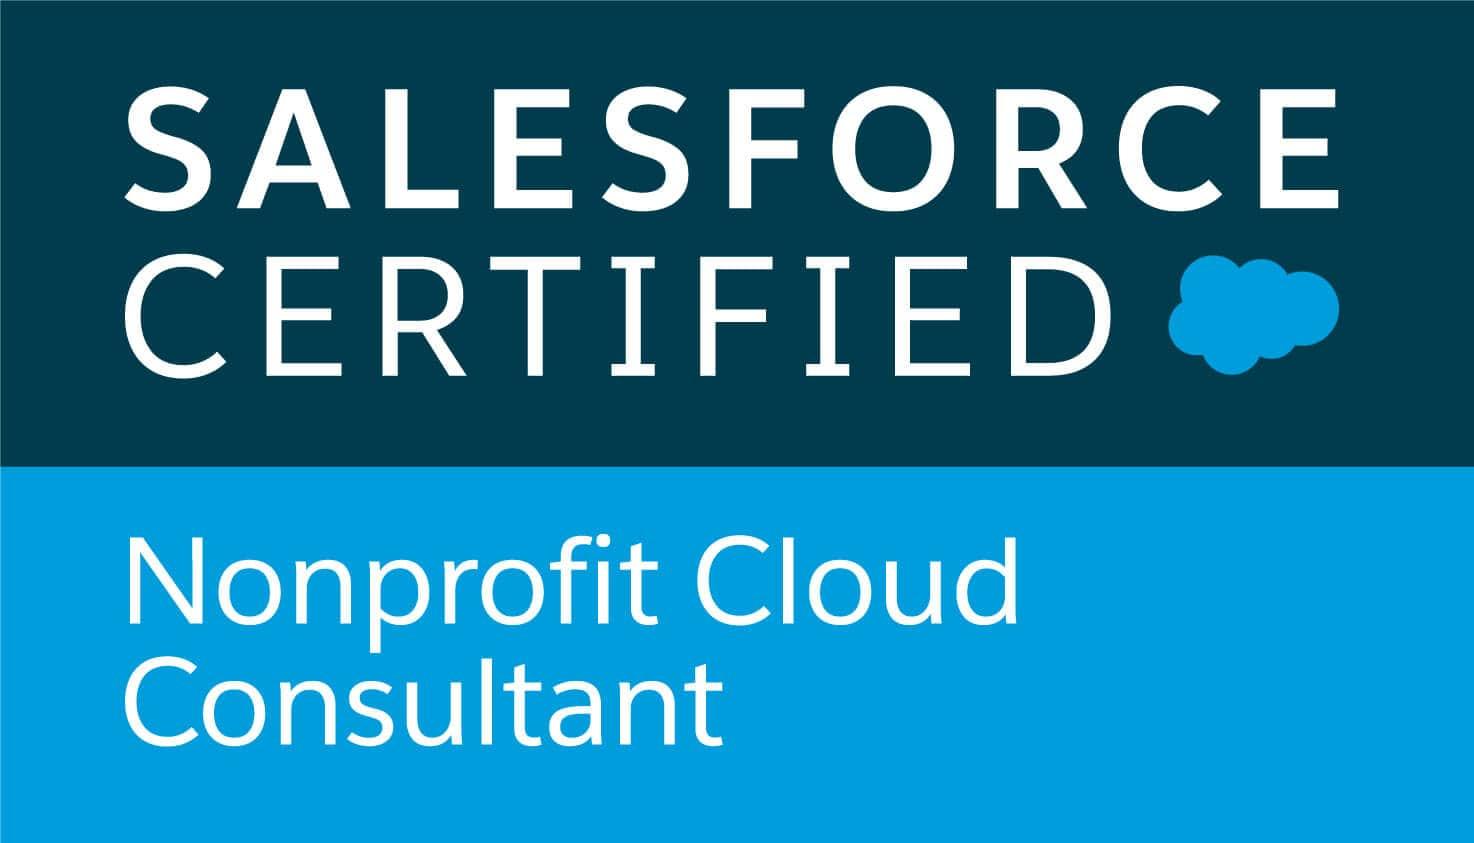 SalesforceCertifiedNonprofitCloudConsultant-min